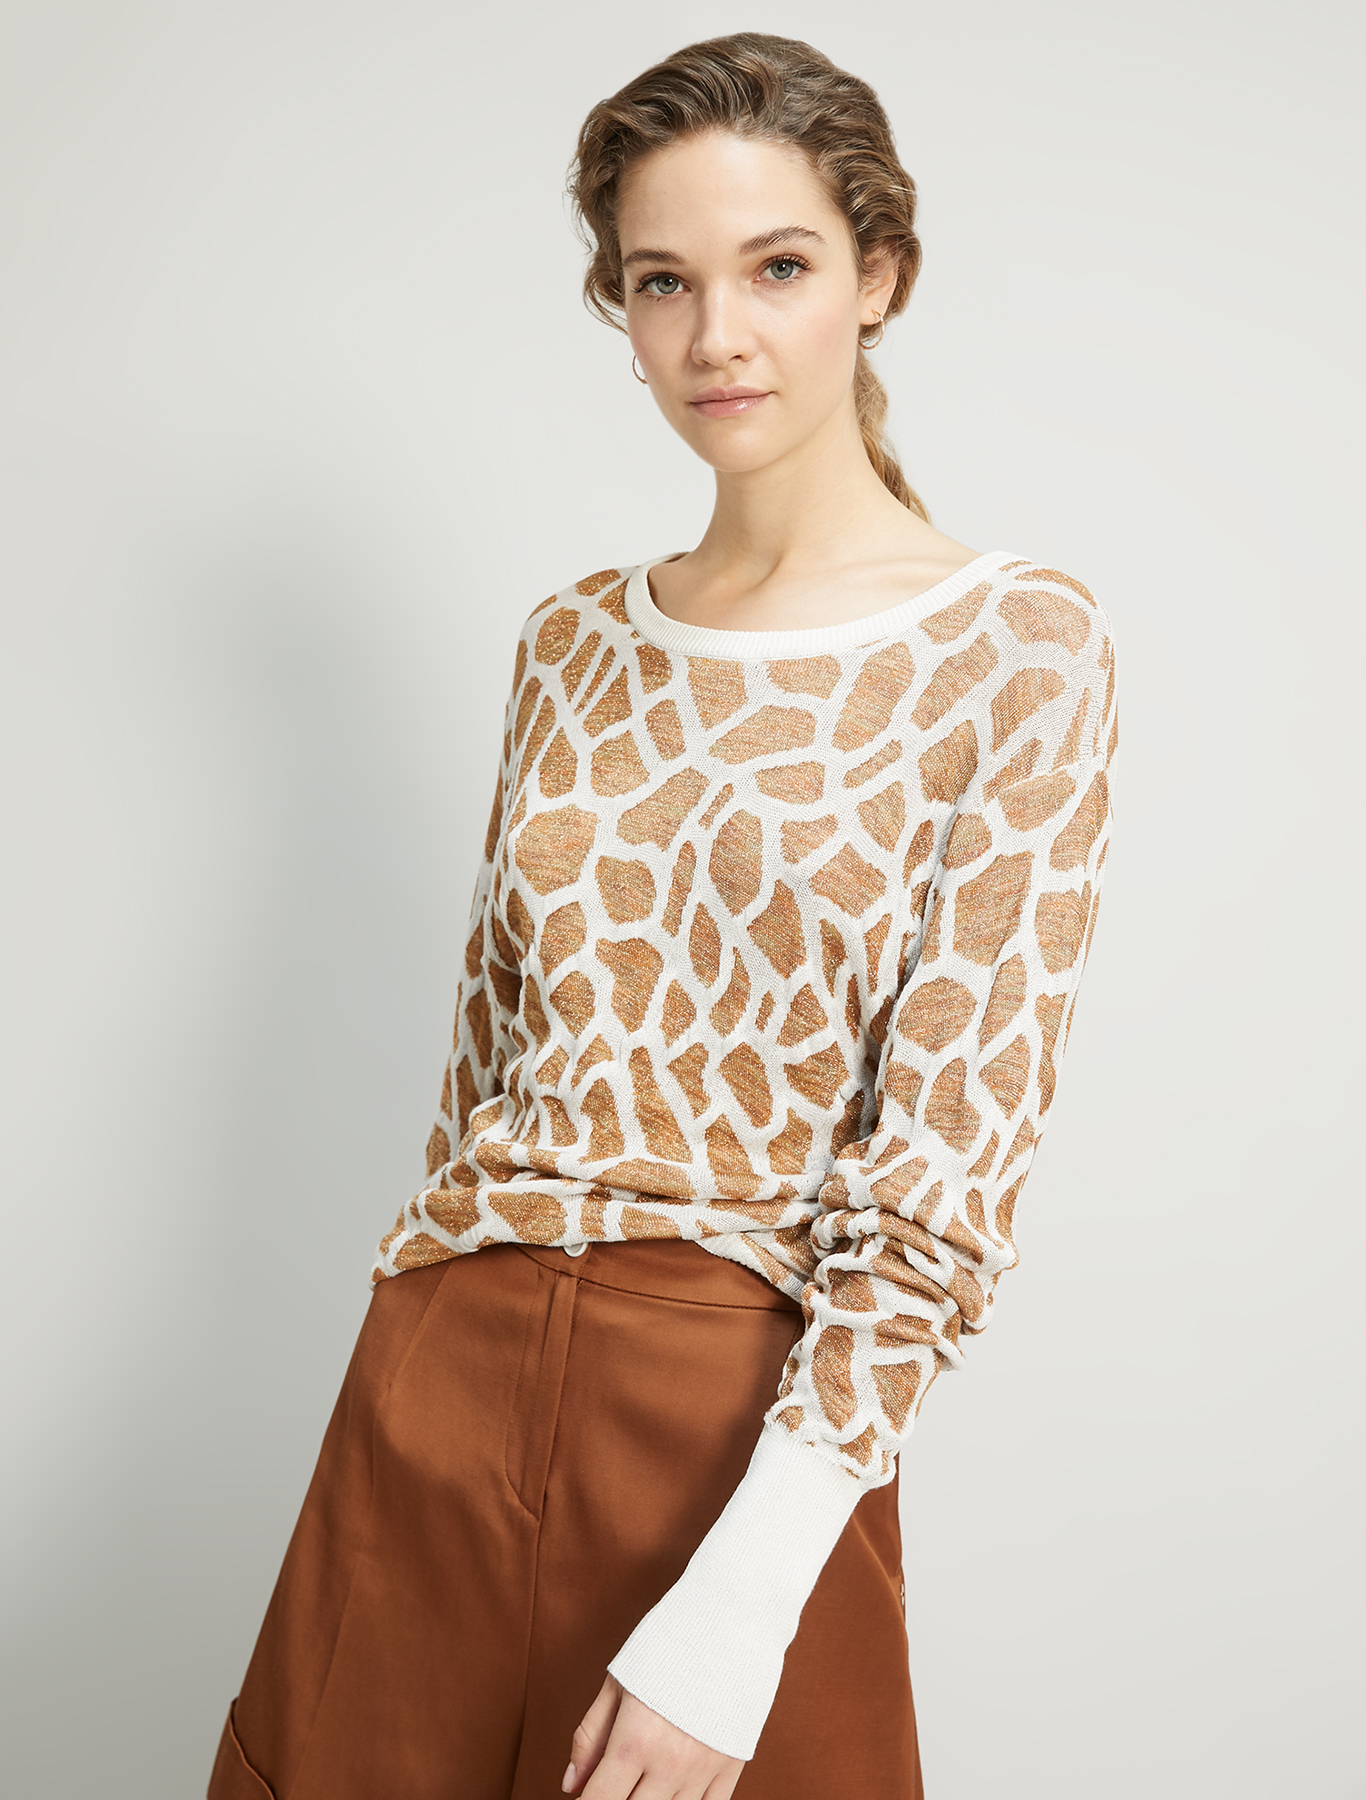 Giraffe jacquard sweater - white - pennyblack